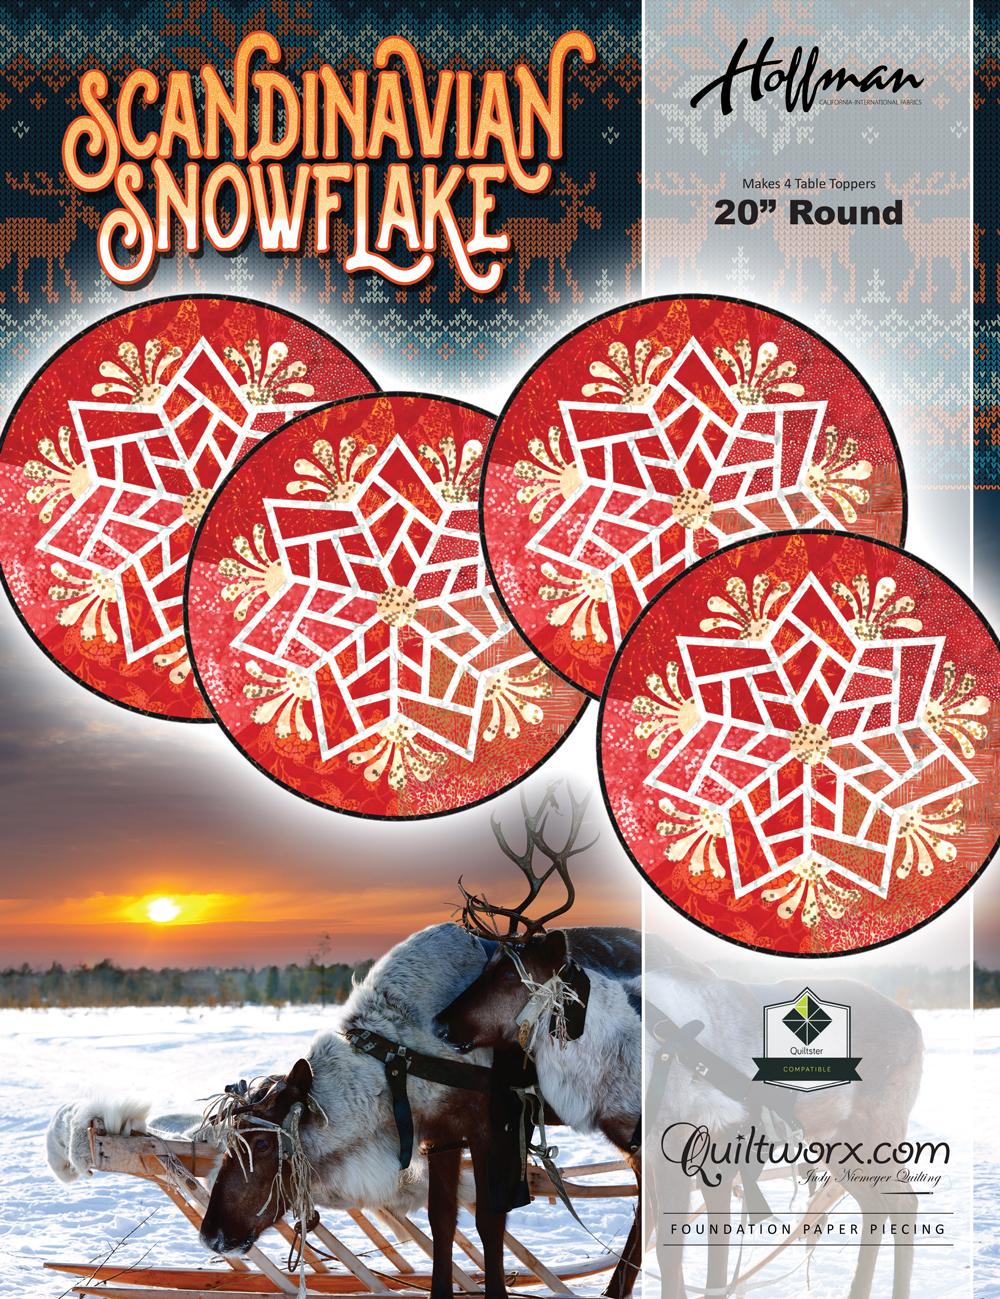 Scandinavian-Snowflake-Hoffman-Cover